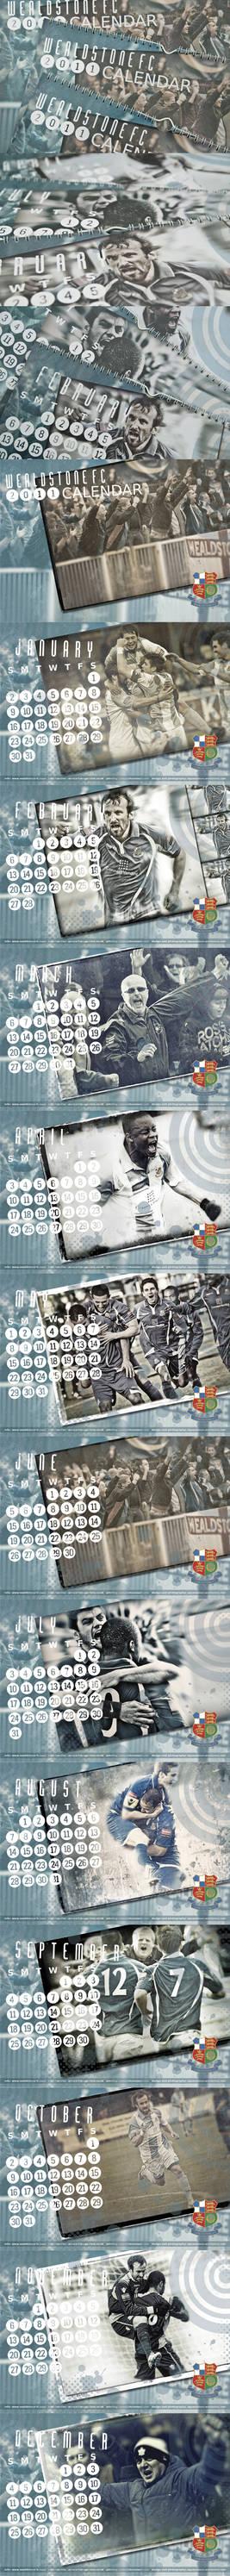 Wealdstone FC 2011 Calendar